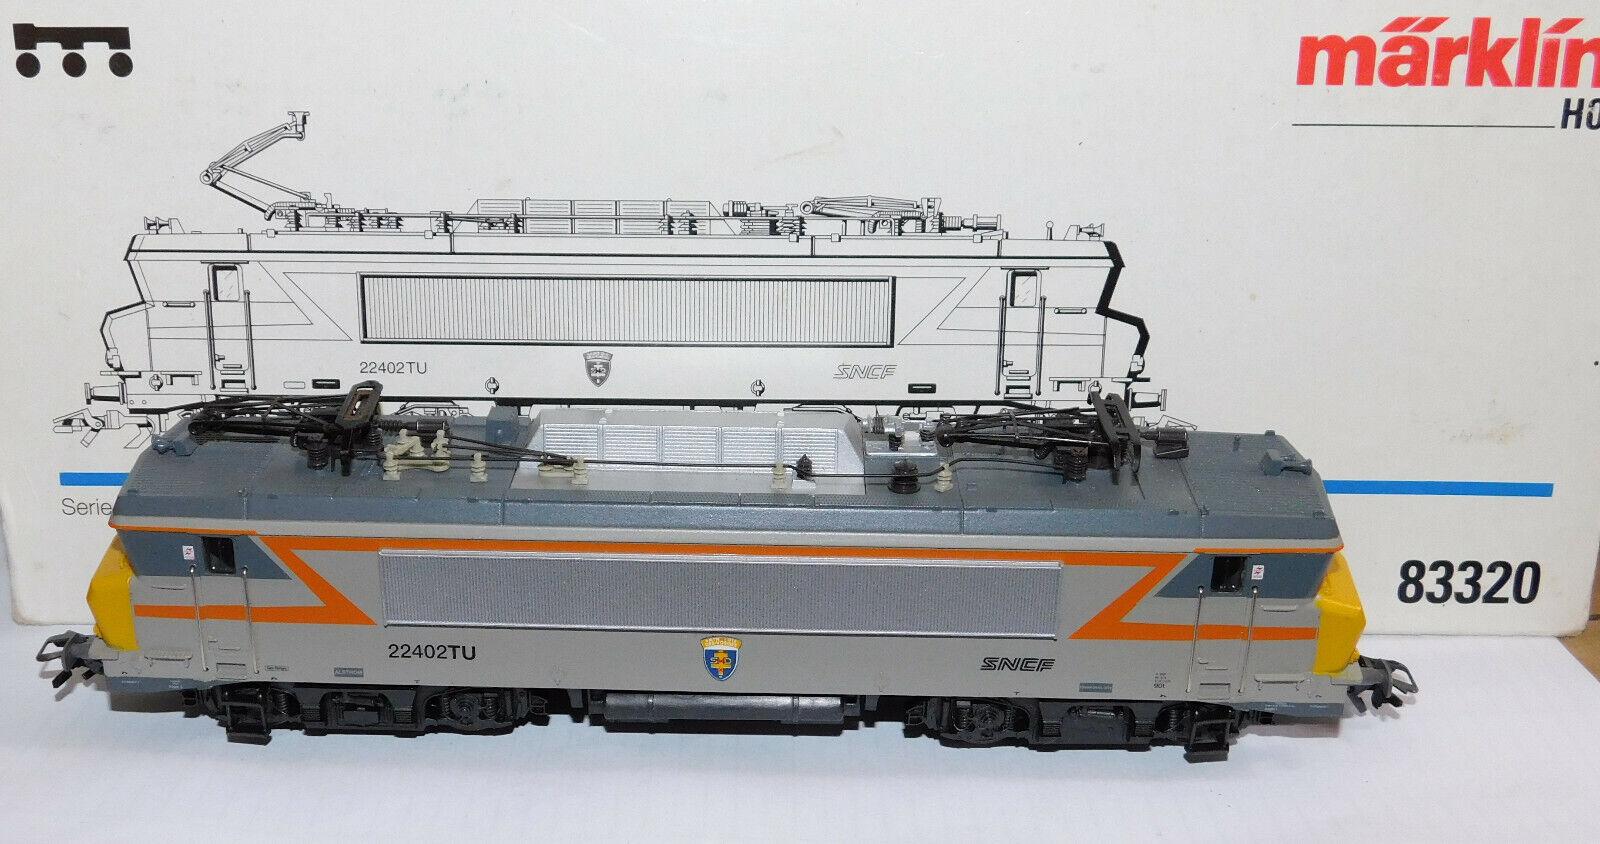 ordina ora goditi un grande sconto MARKLIN 83320 SNCF BB 22200  22402TU DELTA DELTA DELTA DIGITAL  HO GAUGE  fantastica qualità